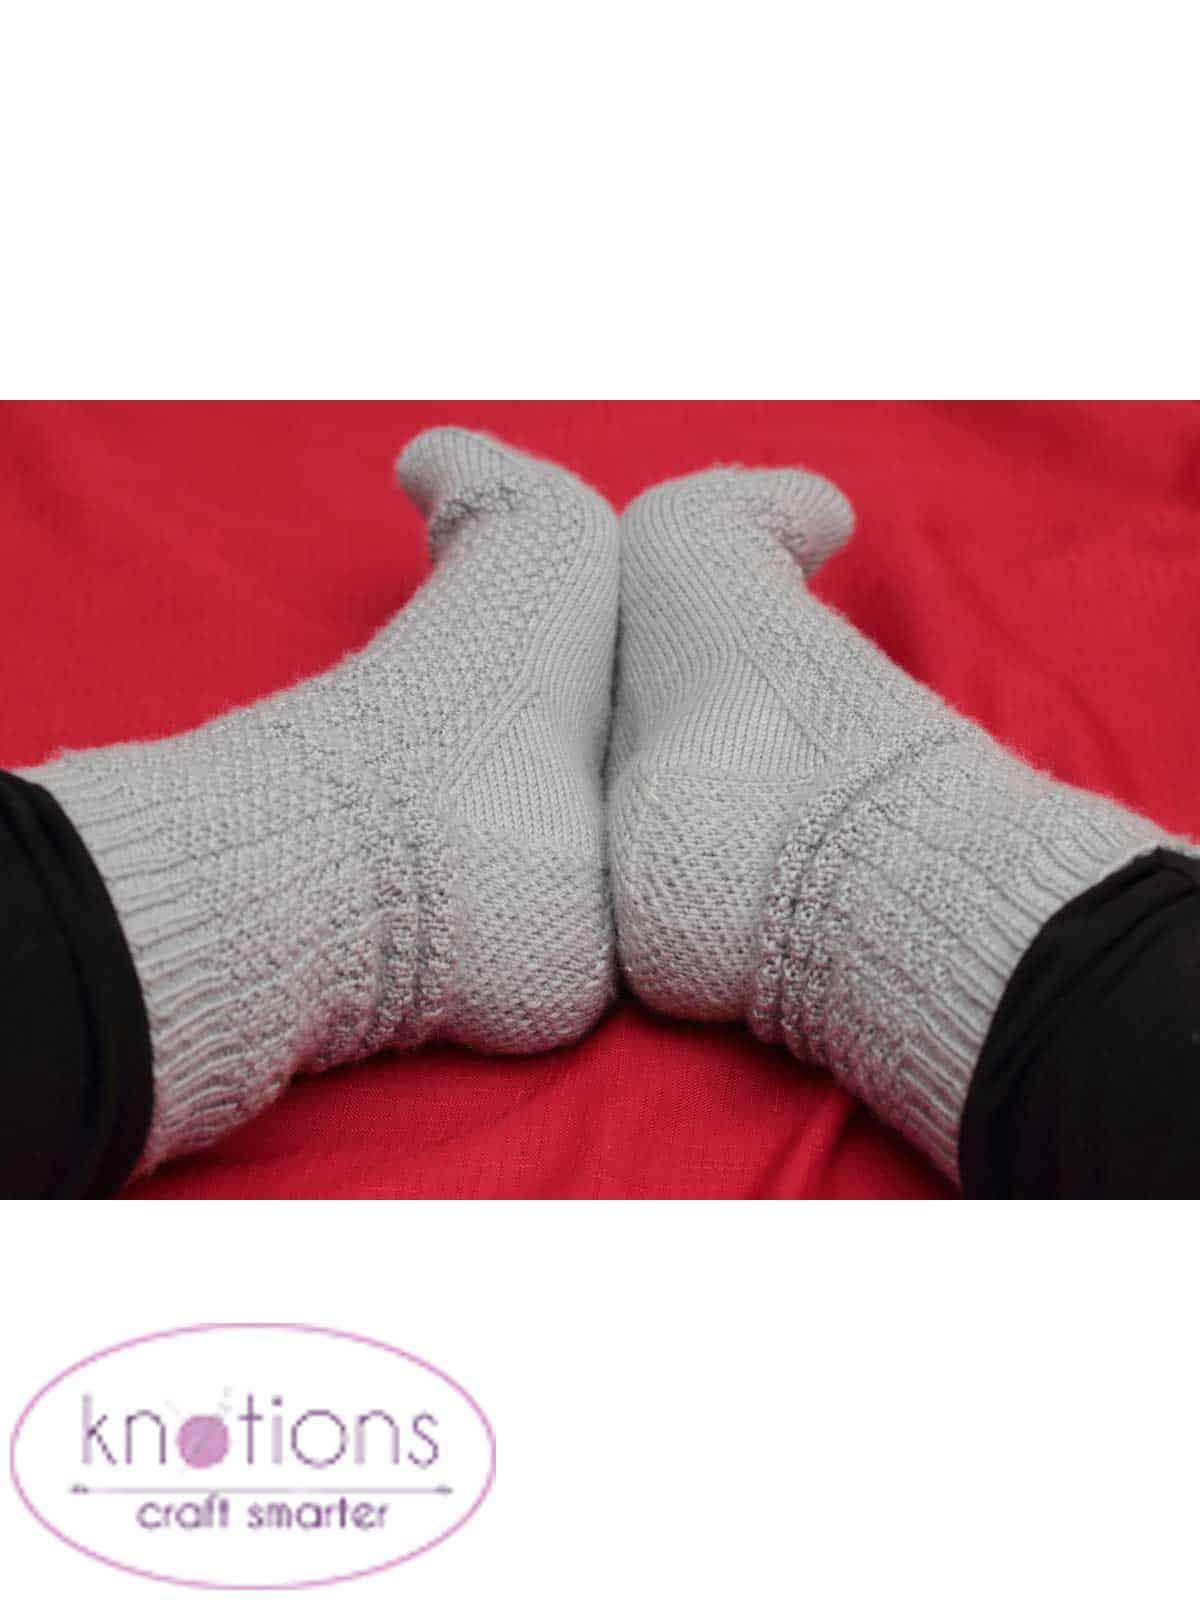 unassuming-socks-5